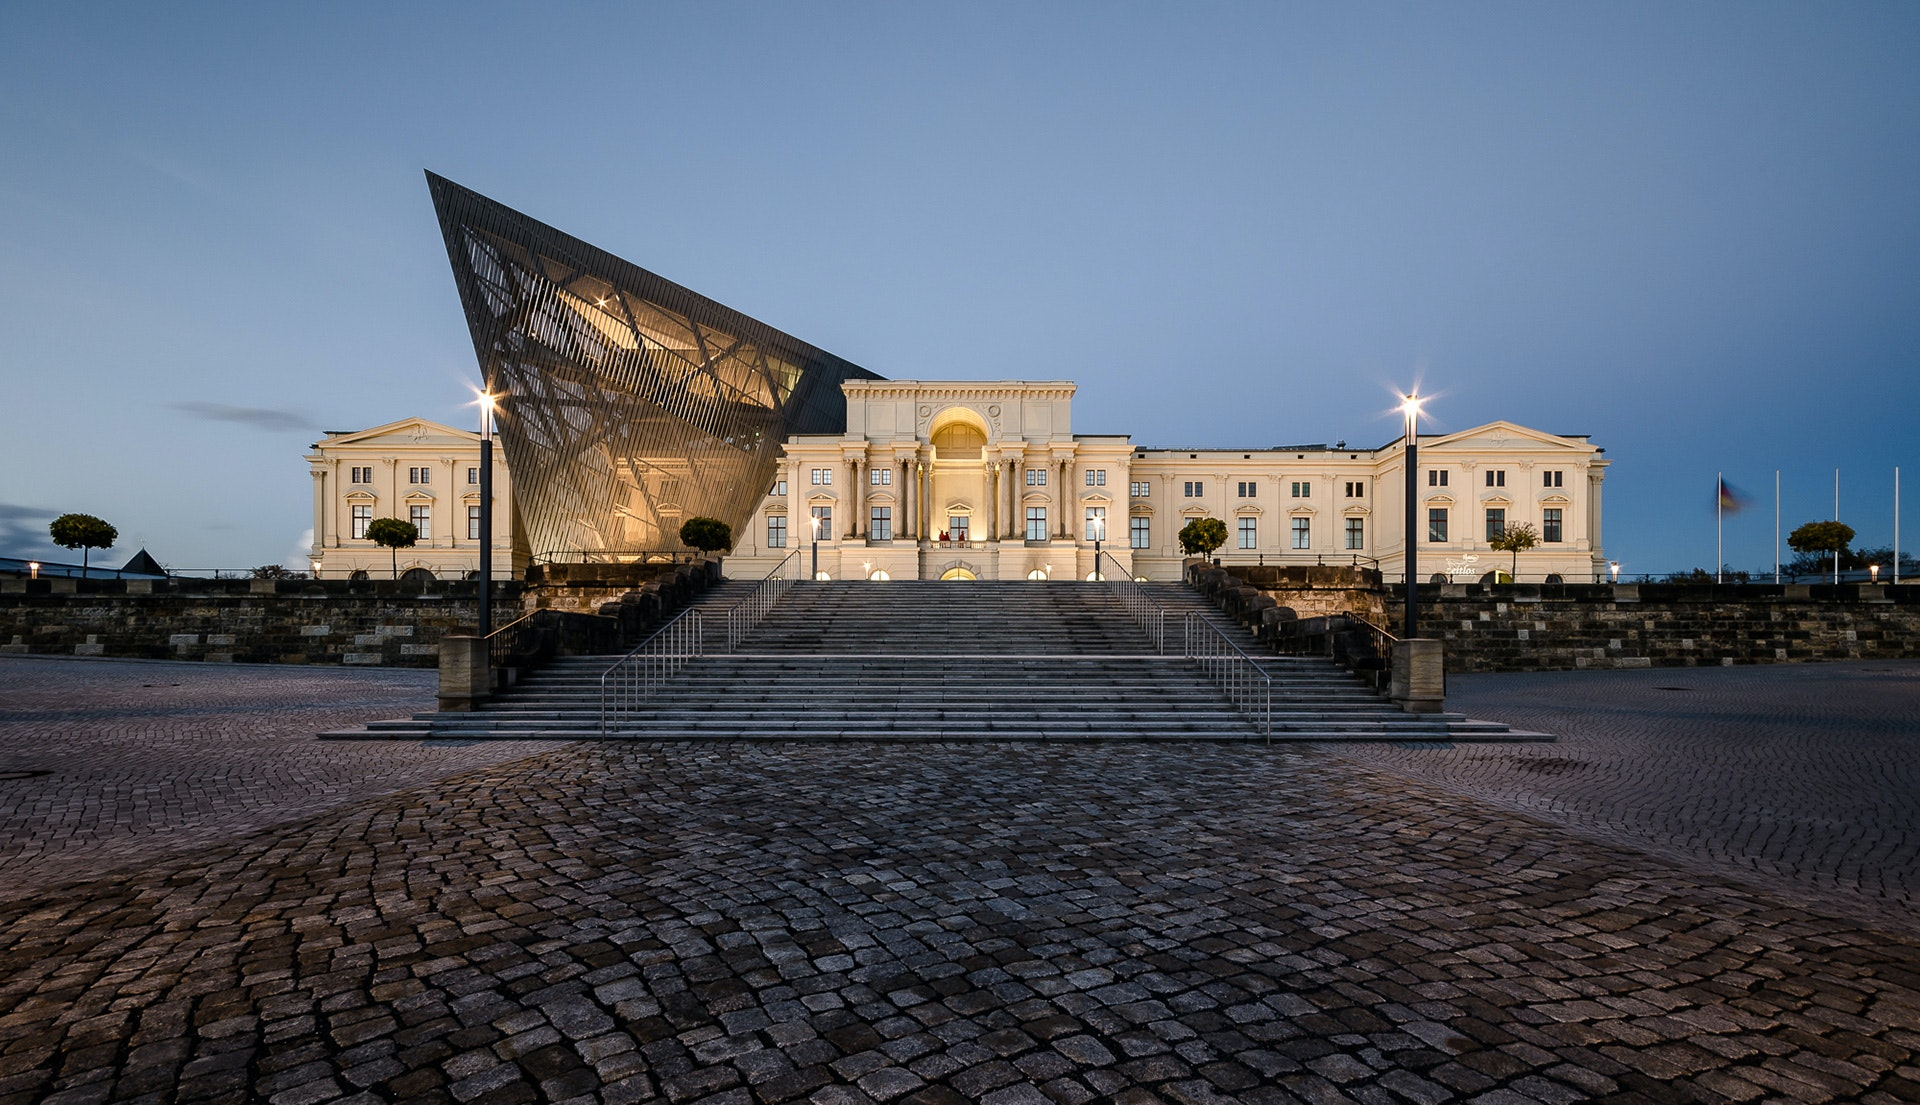 bundeswehr-military-history-museum